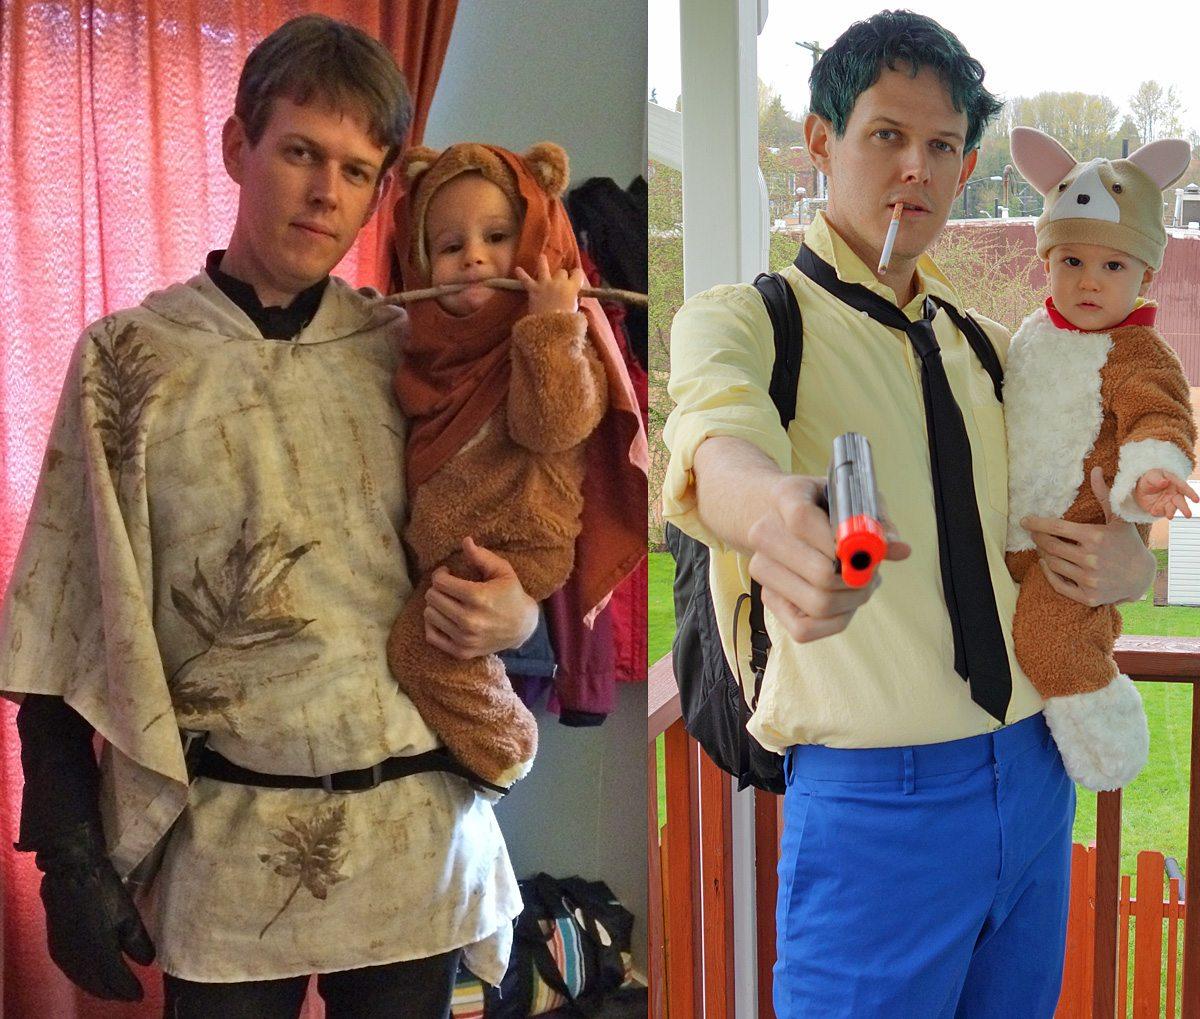 Luke/Ewok and Spike/Ein cosplay. Photo by Will James.